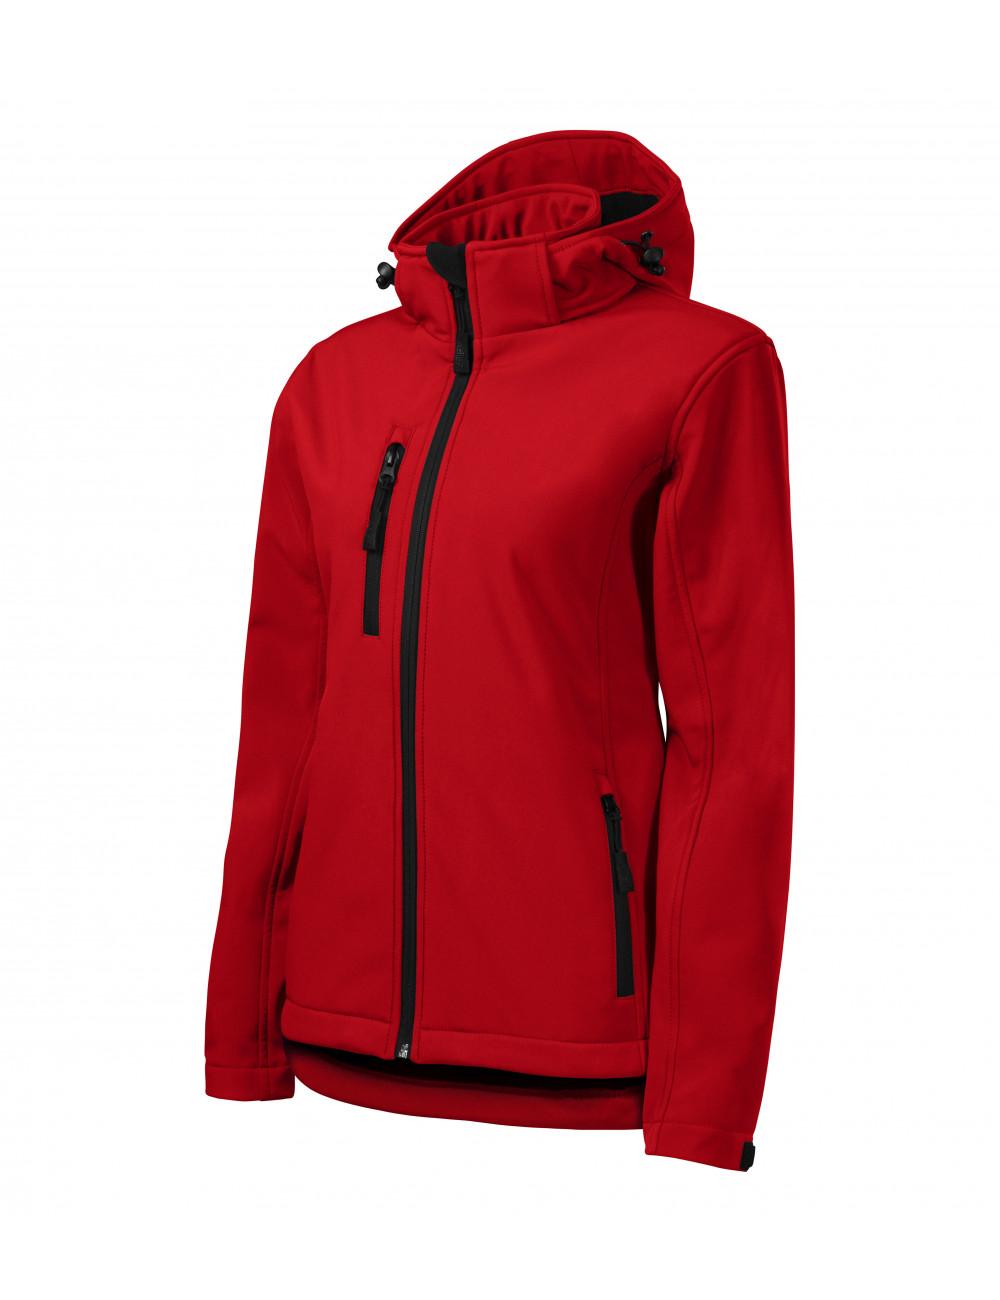 Adler MALFINI Softshell kurtka damska Performance 521 czerwony